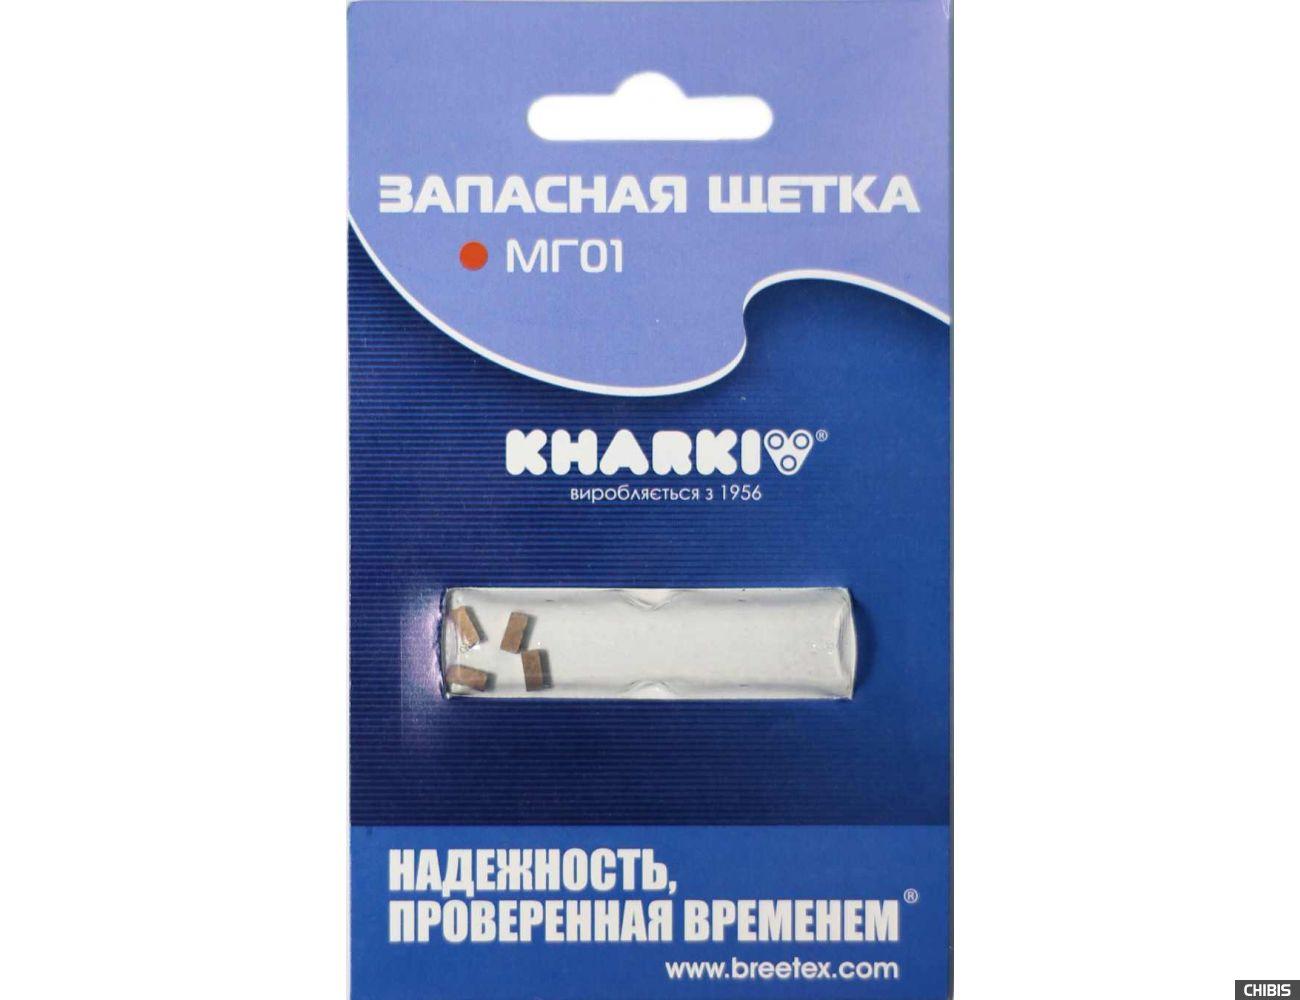 Щетки МГ01 для электробритв Харьков, Агидель 4 шт блистер